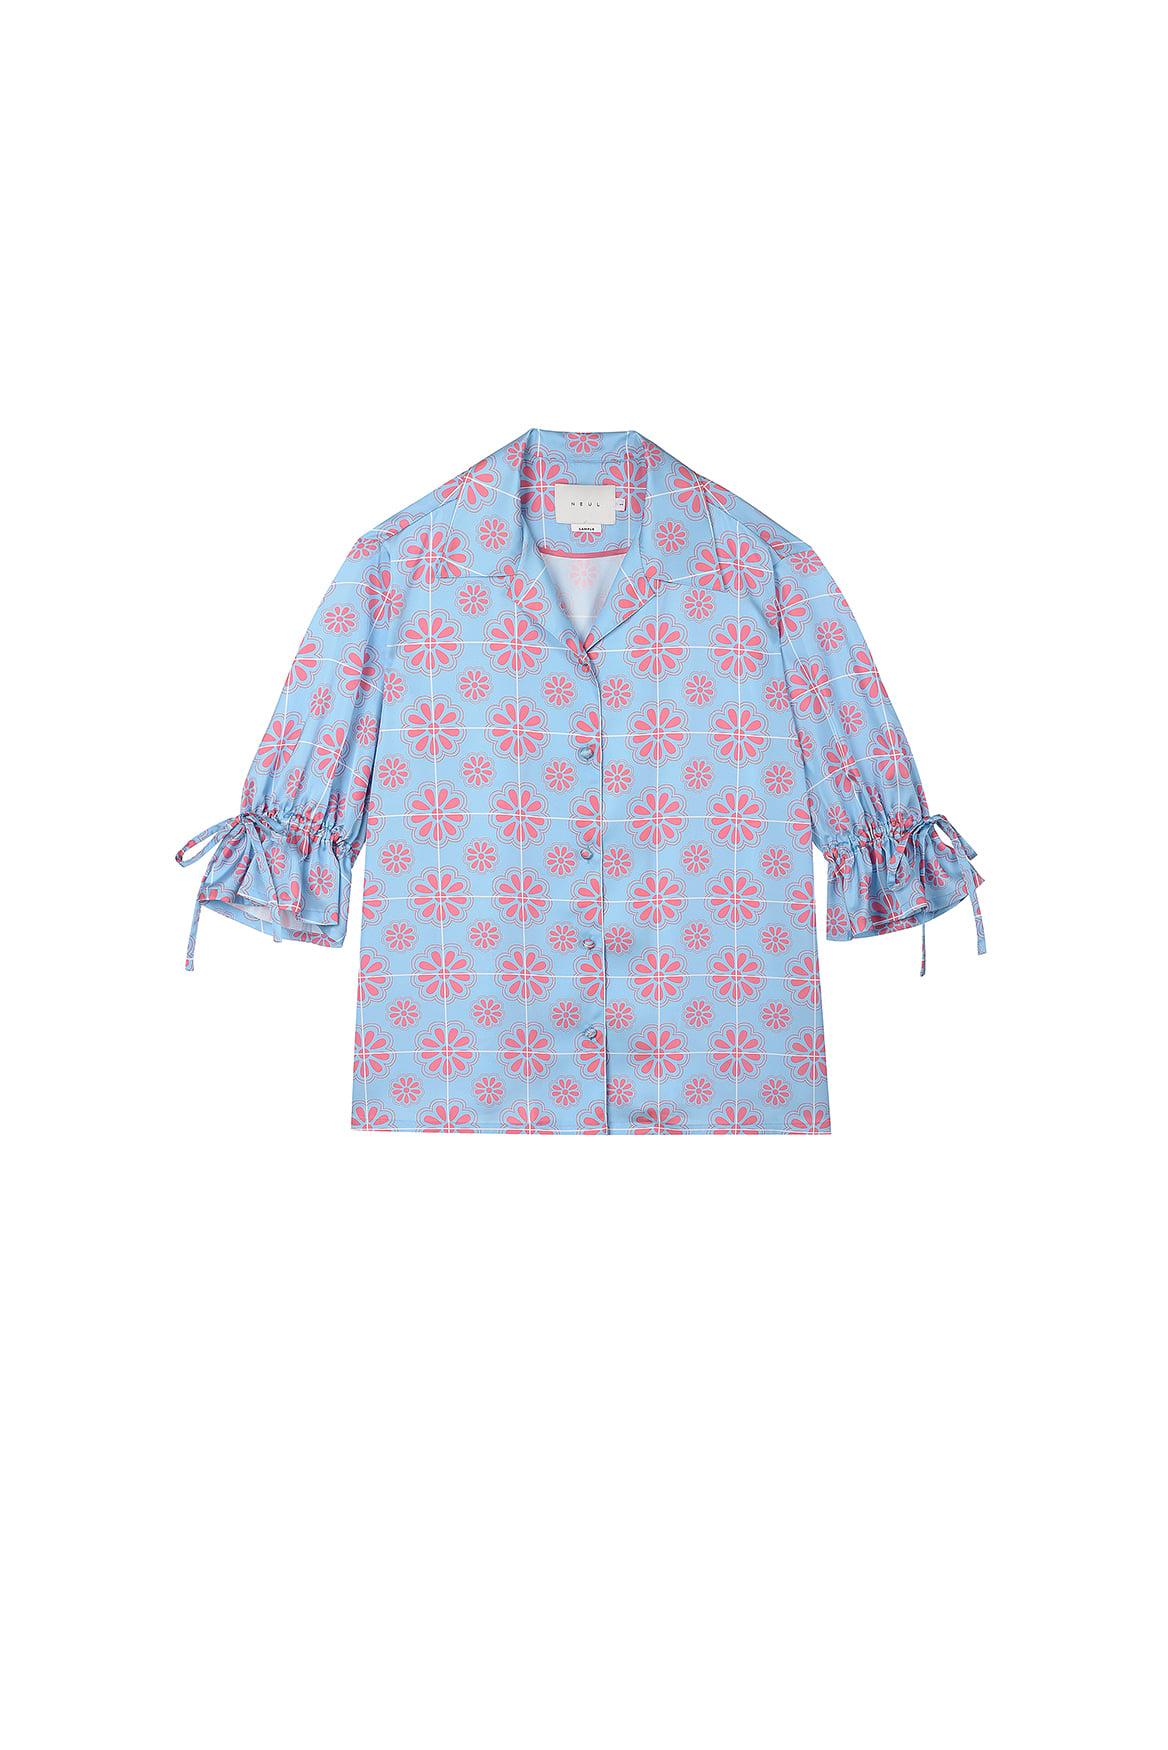 Drawstring Sleeve Shirts